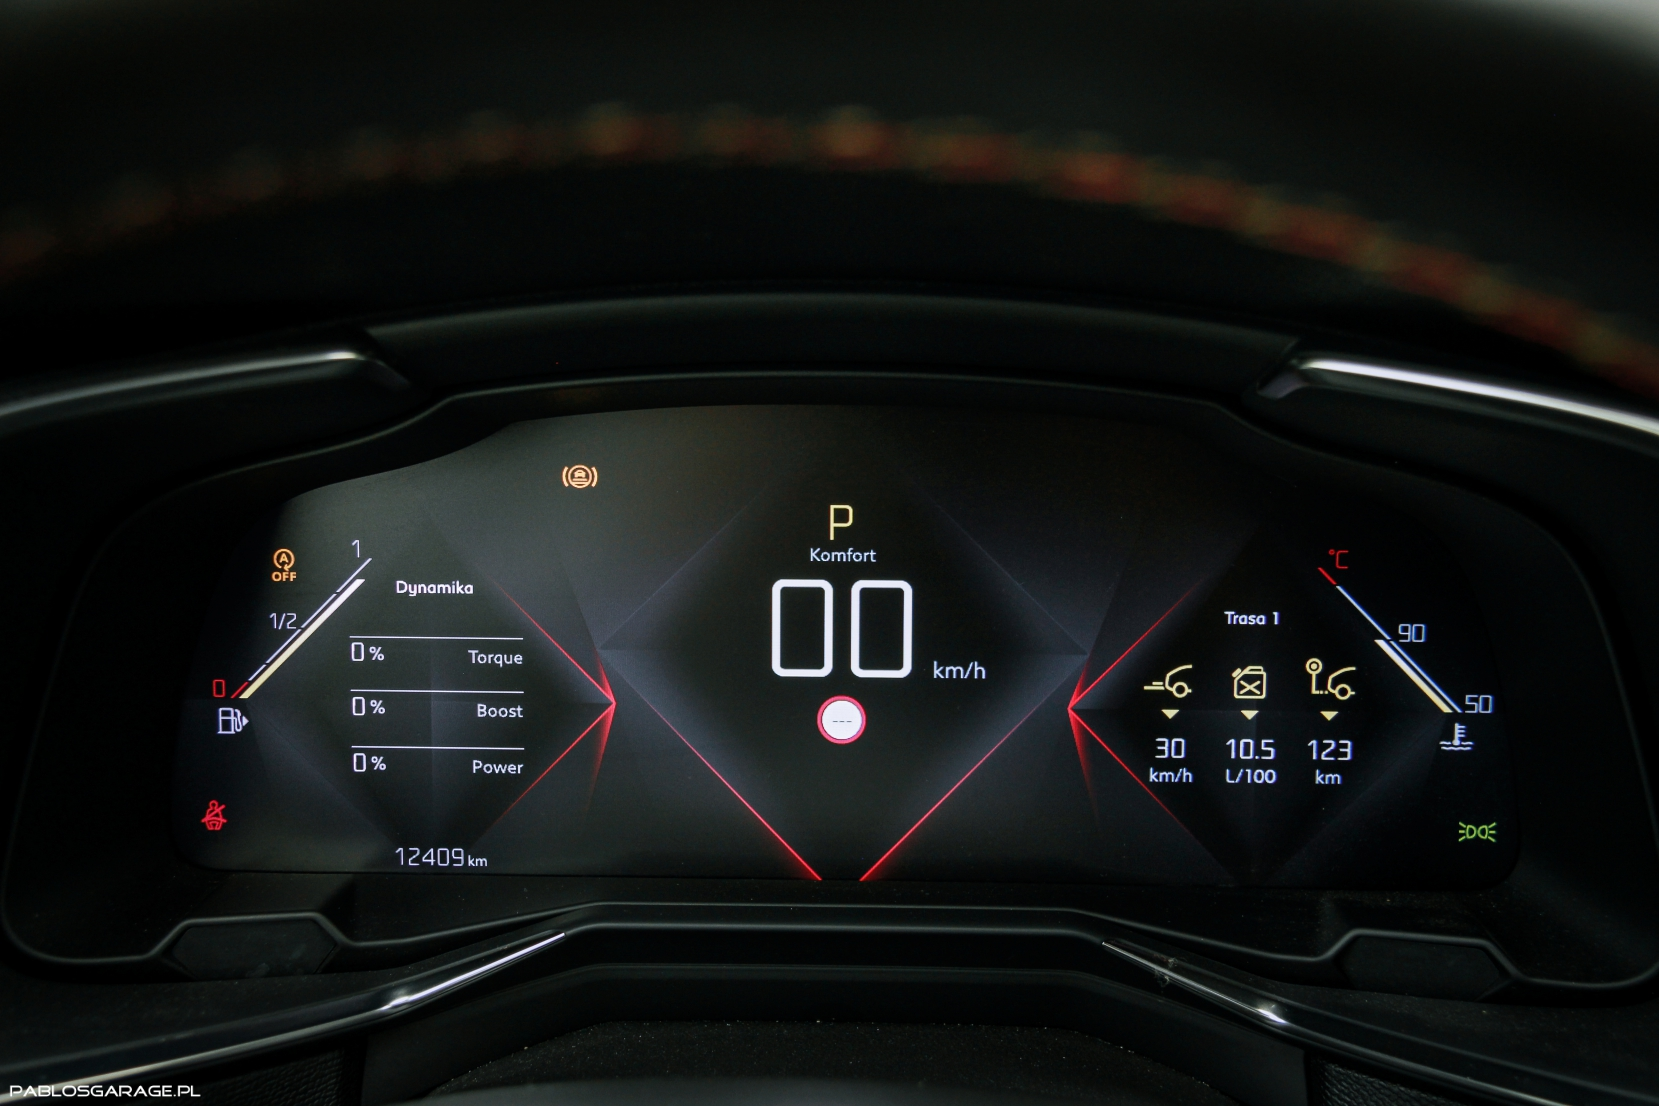 DS7 Crossback 1.6 PureTech 225 KM Performance line